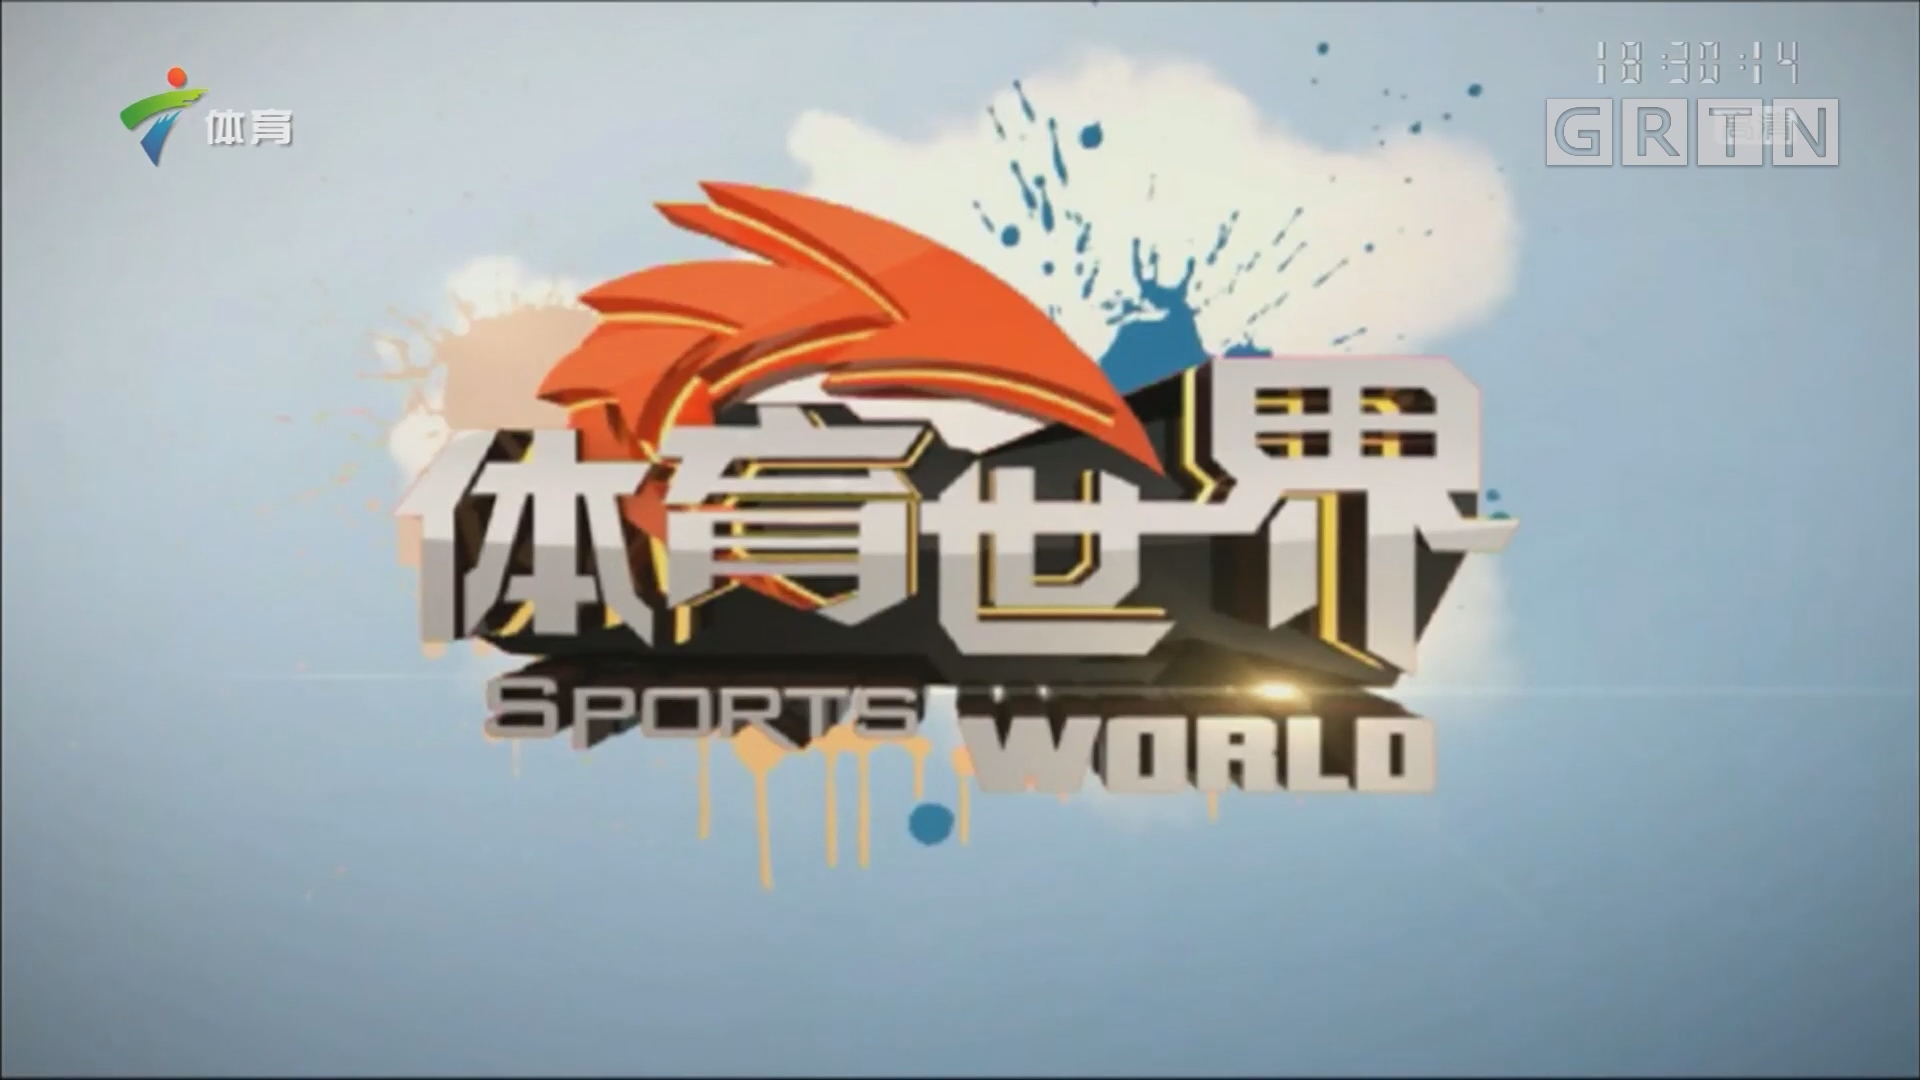 [HD][2017-11-03]体育世界:徐闻新旧古道齐放异彩